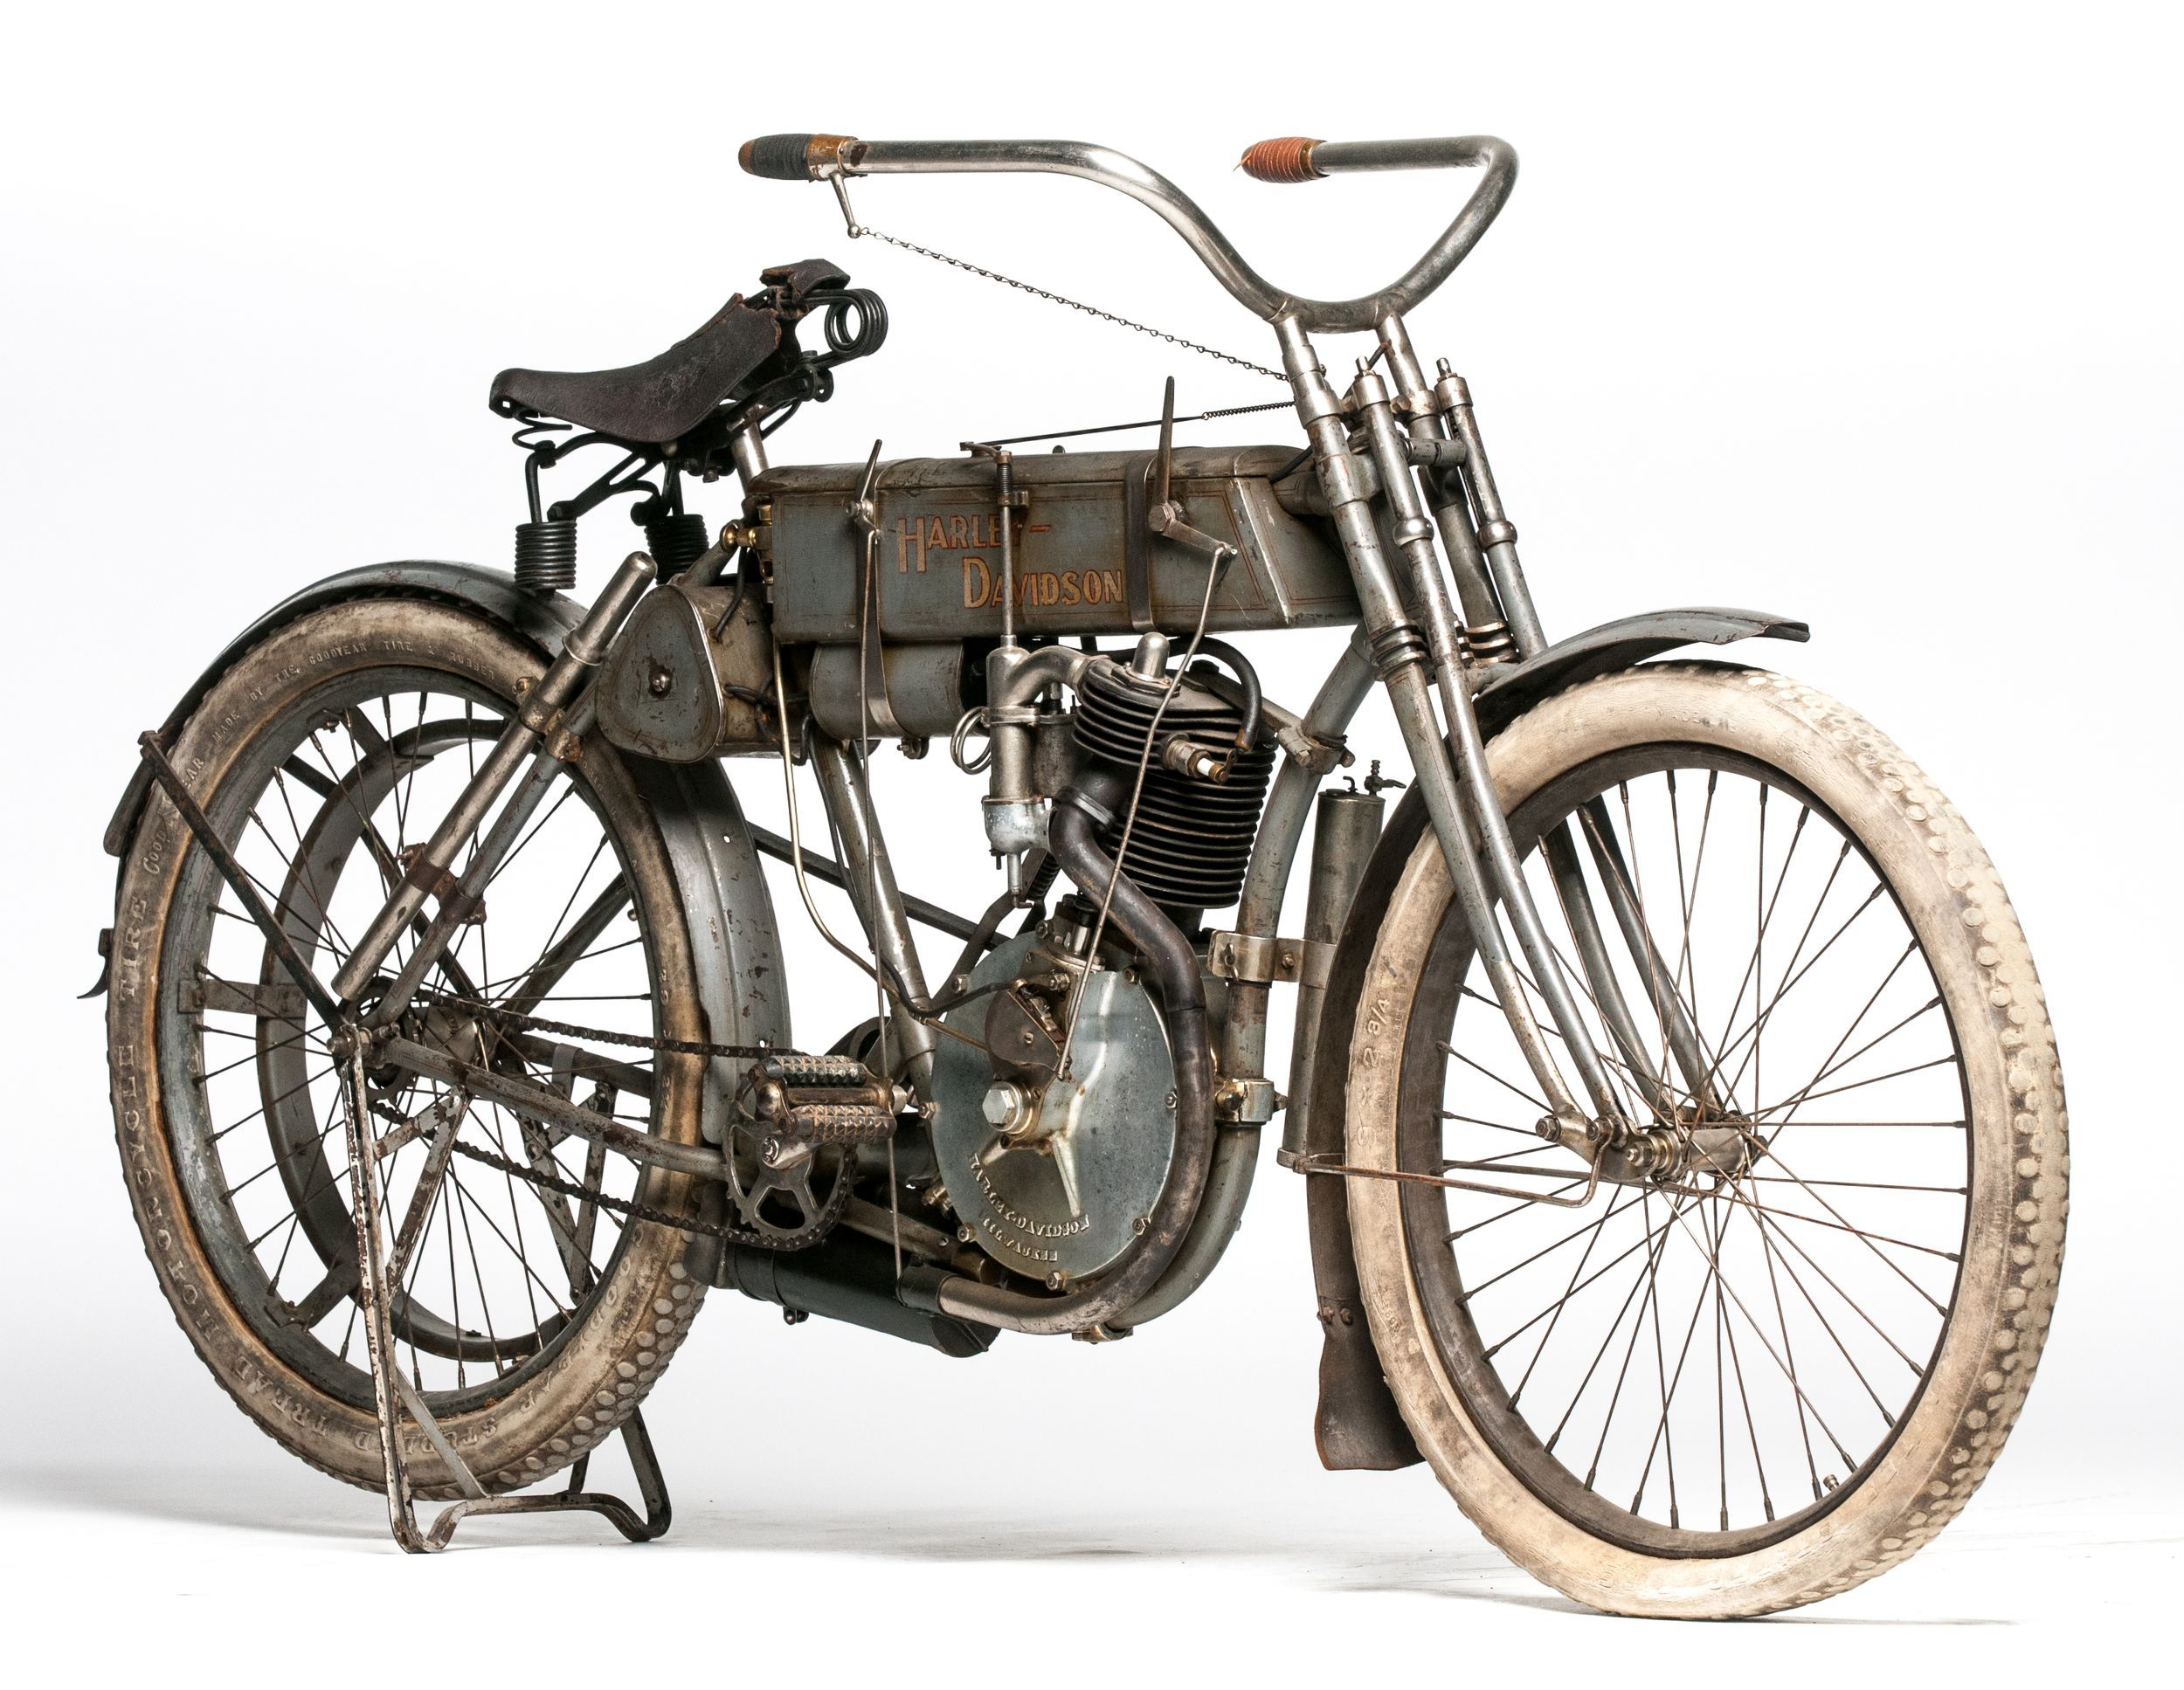 1907 Harley Davidson Strap Tank Shatters Marque Record At Harley